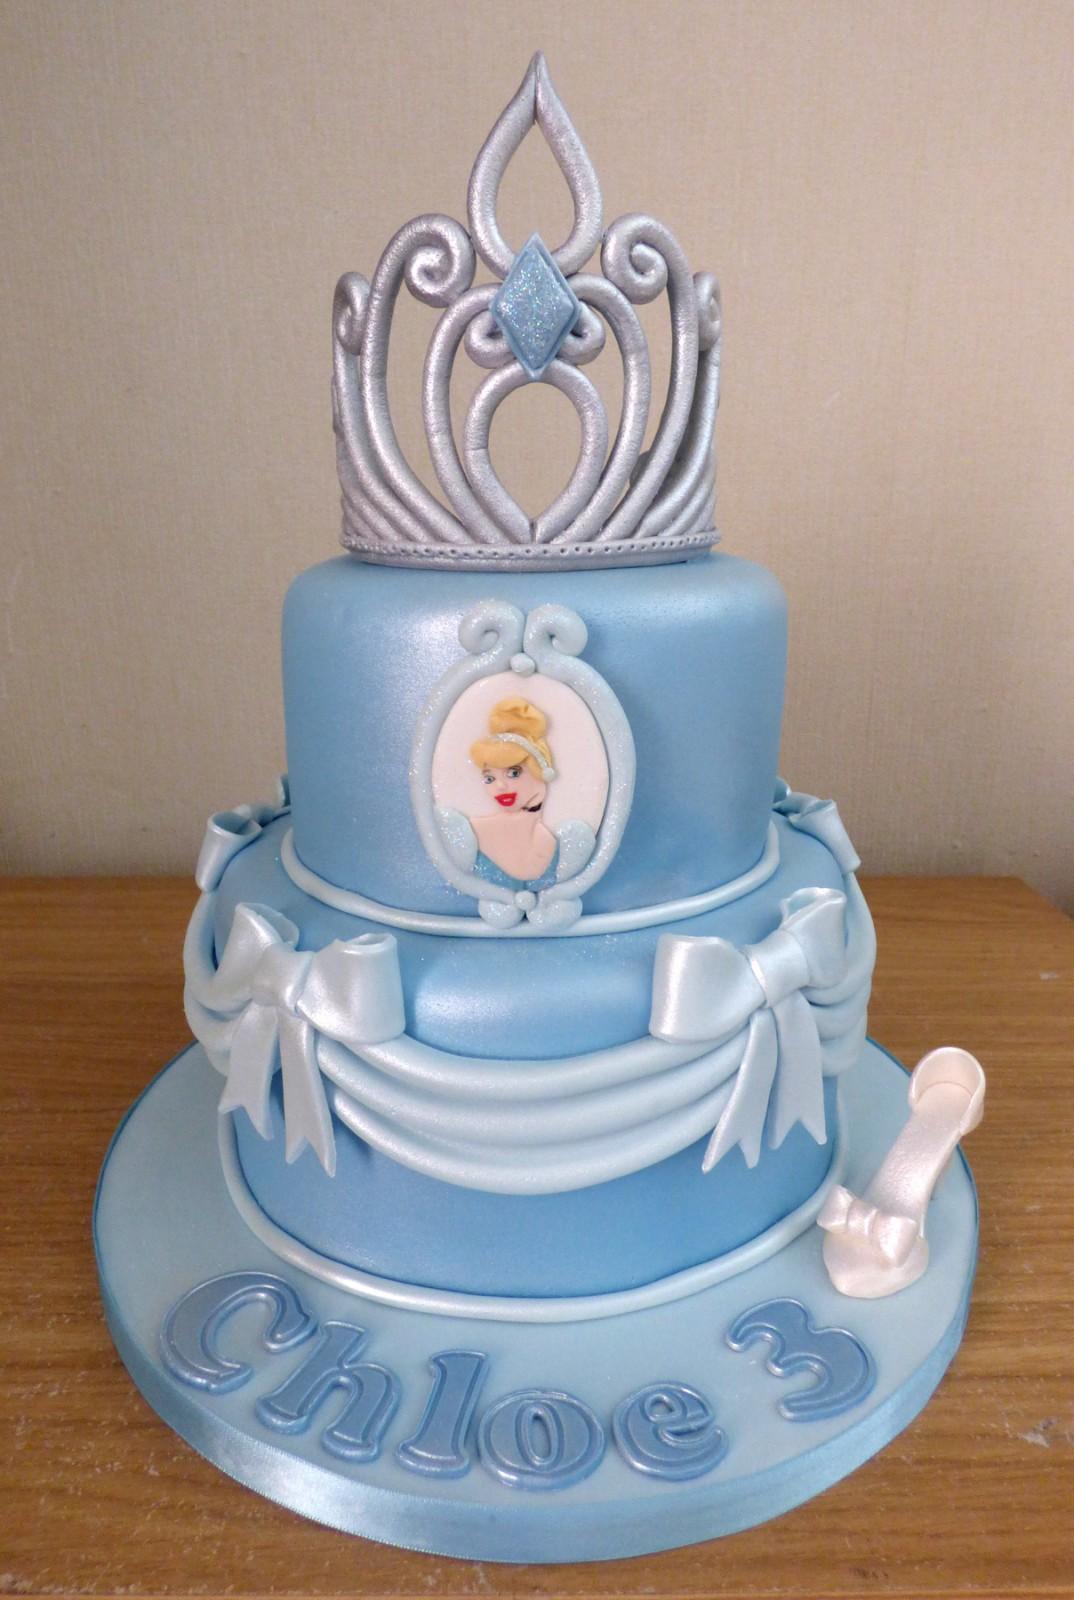 Prime 2 Tier Cinderella Princess Tiara Birthday Cake Susies Cakes Funny Birthday Cards Online Drosicarndamsfinfo